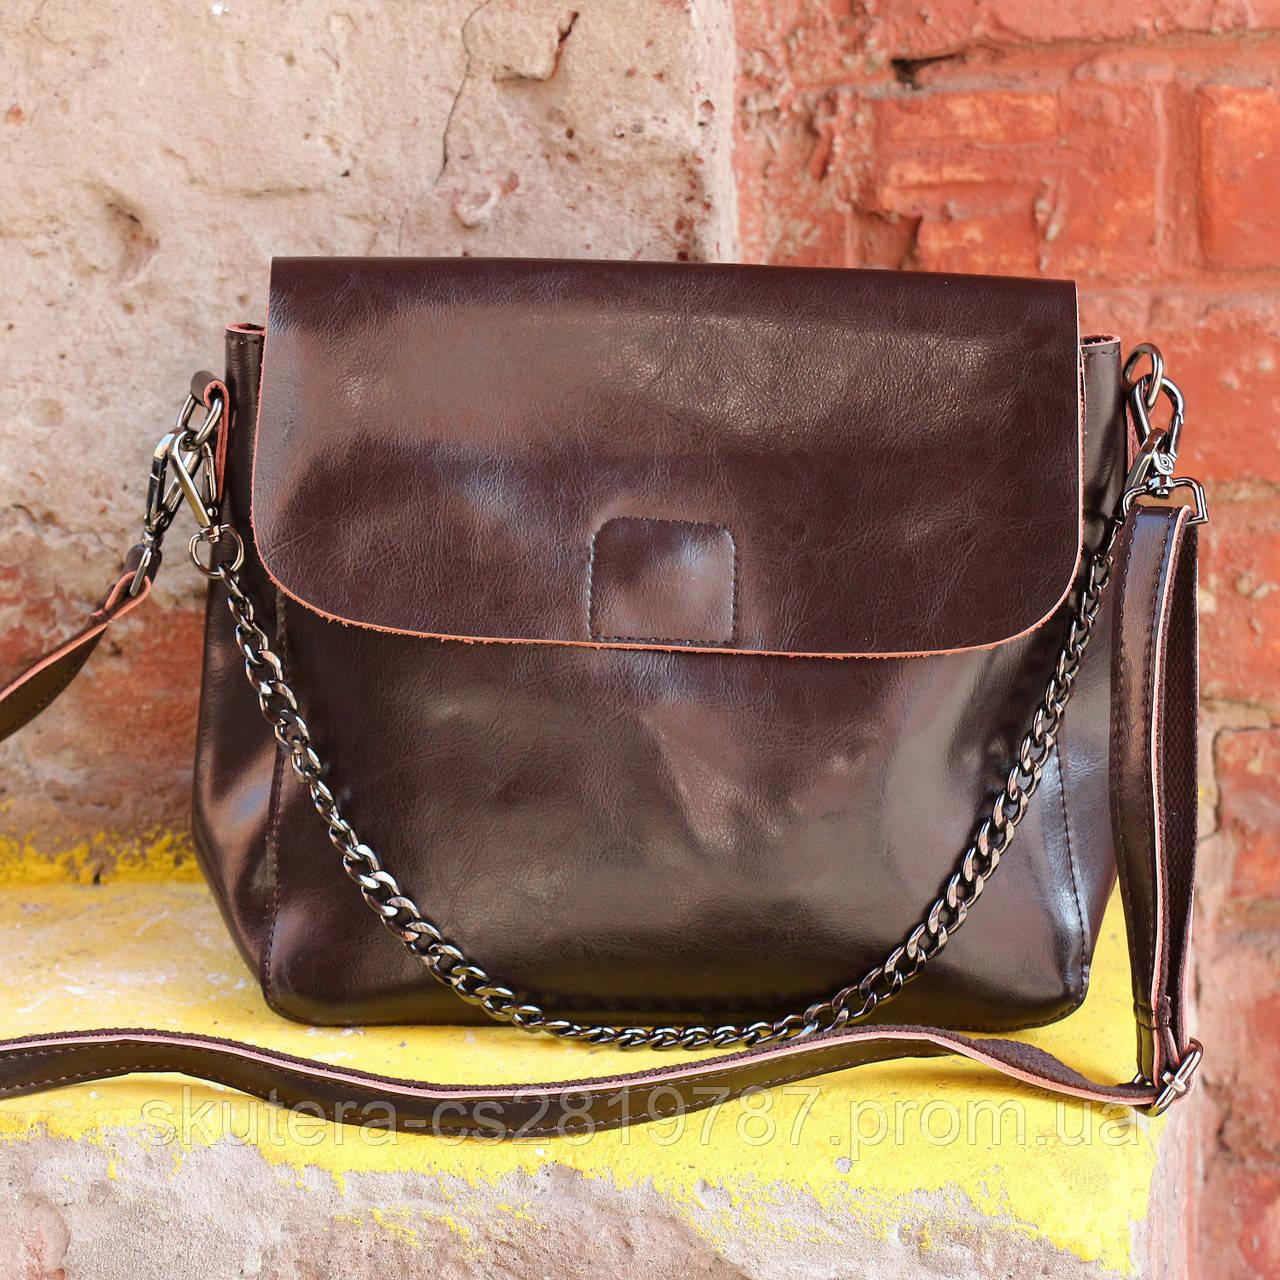 73e7070ef5aa Женская кожаная сумка